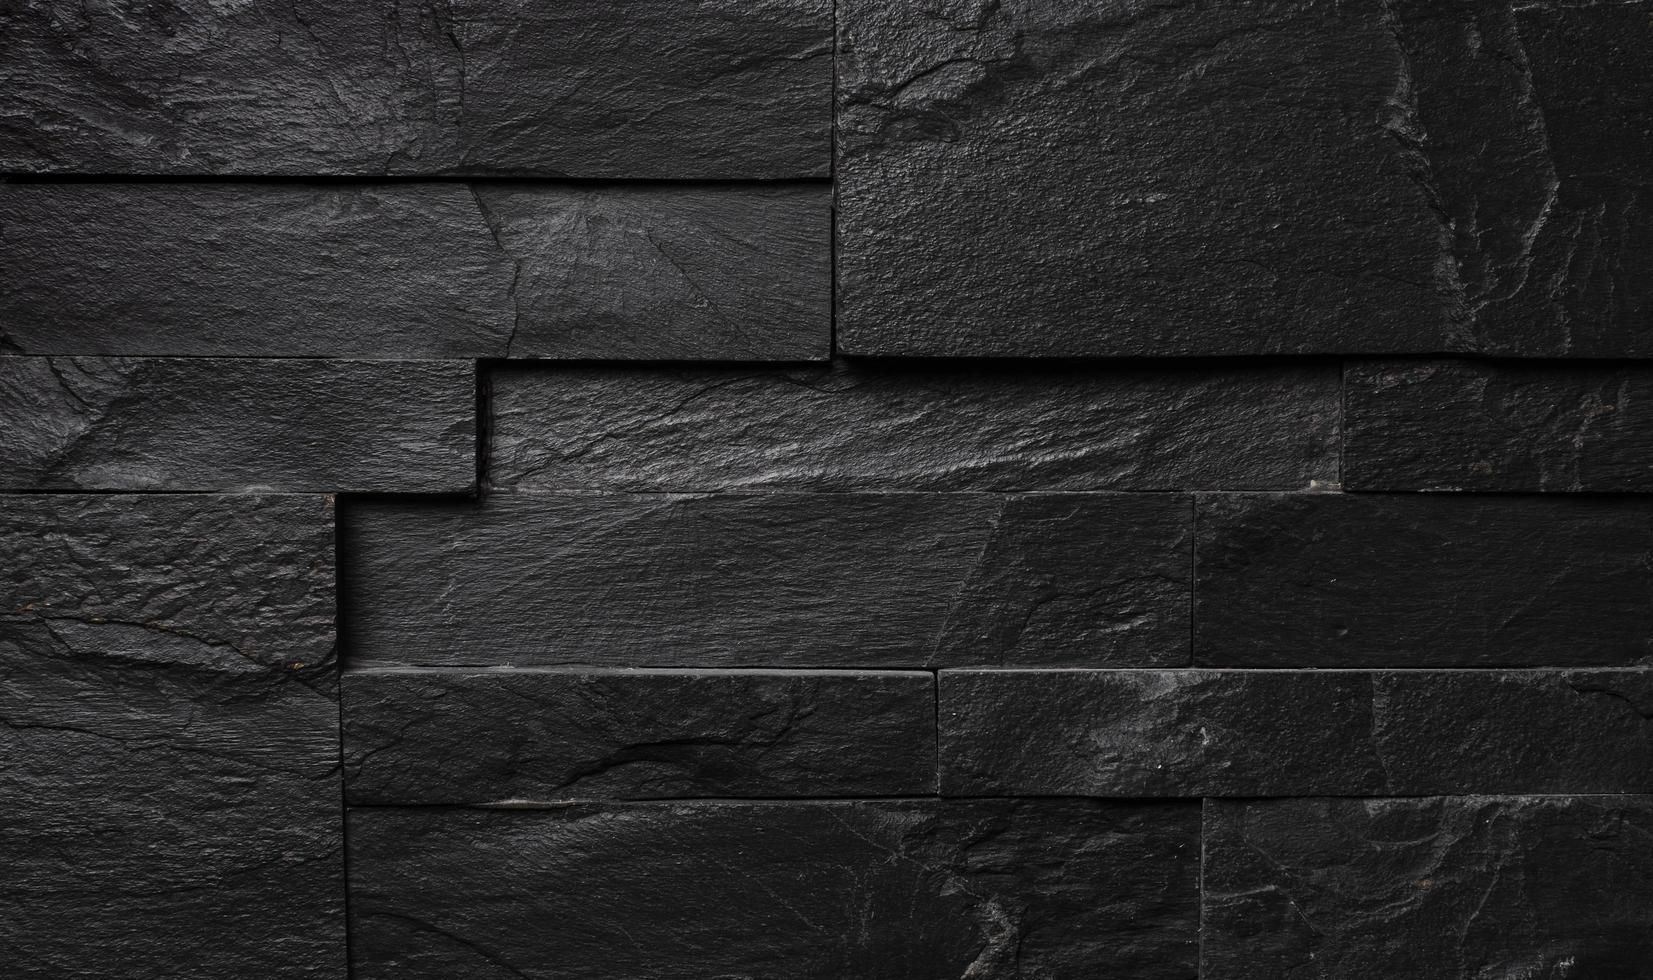 Blackened brick wall, industrial texture photo